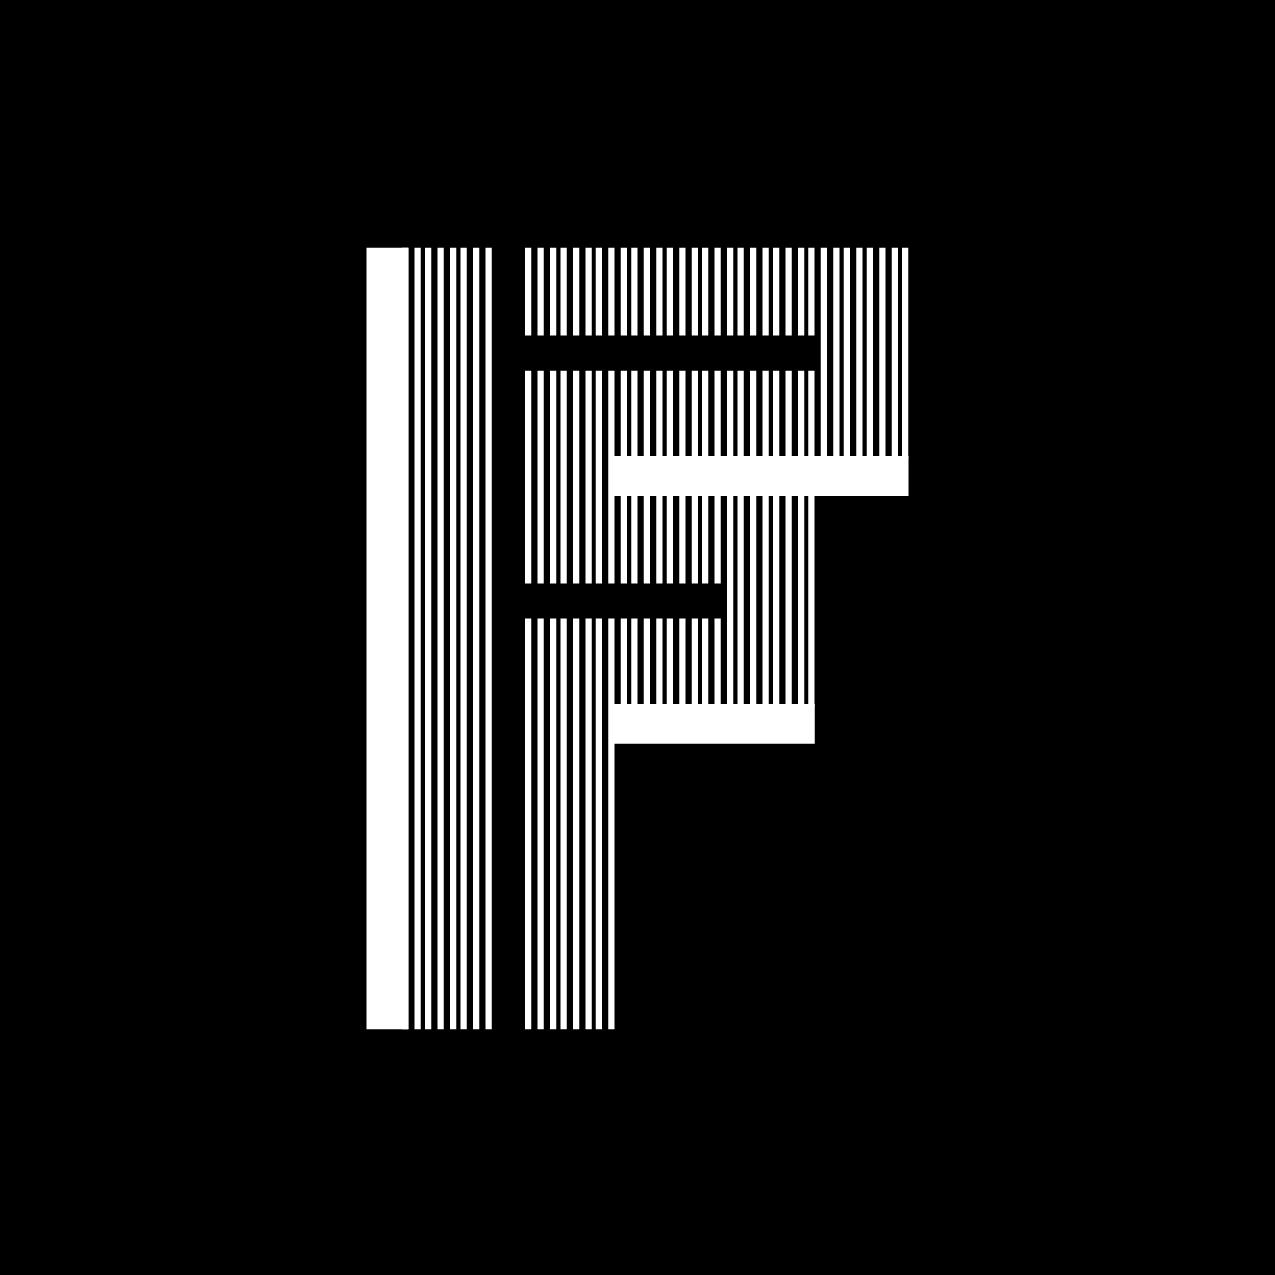 Letter F12 design by Furia